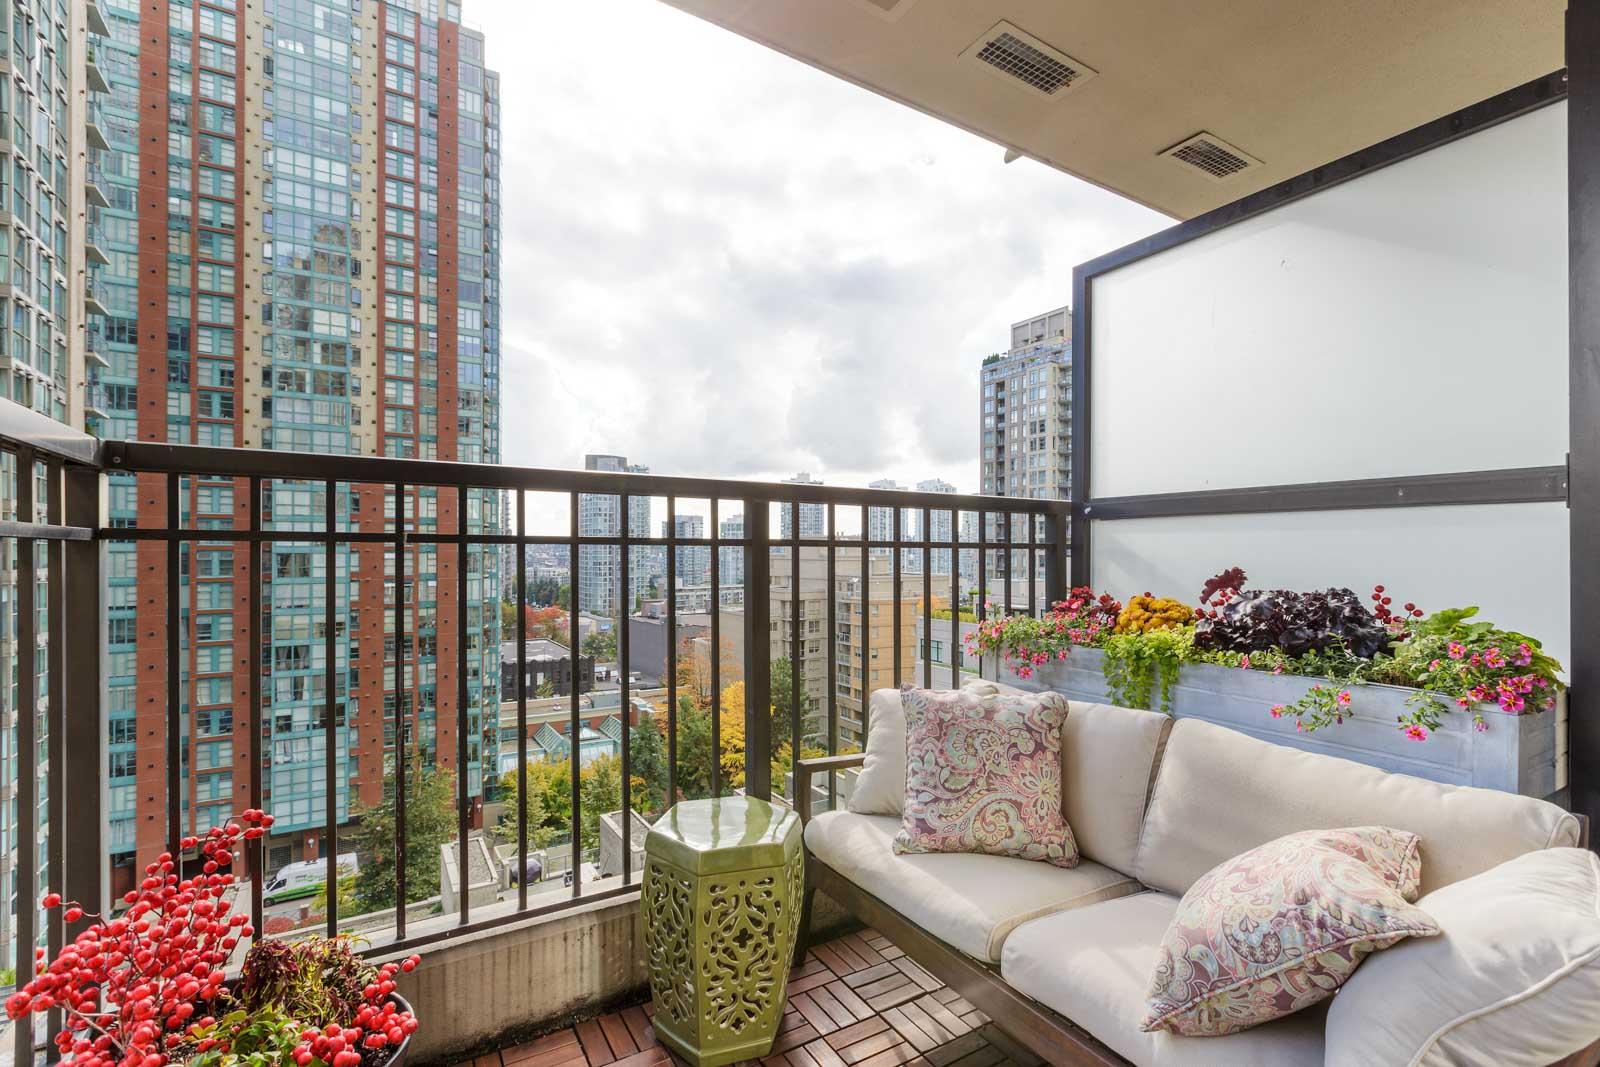 balcony of upscale Vancouver condo